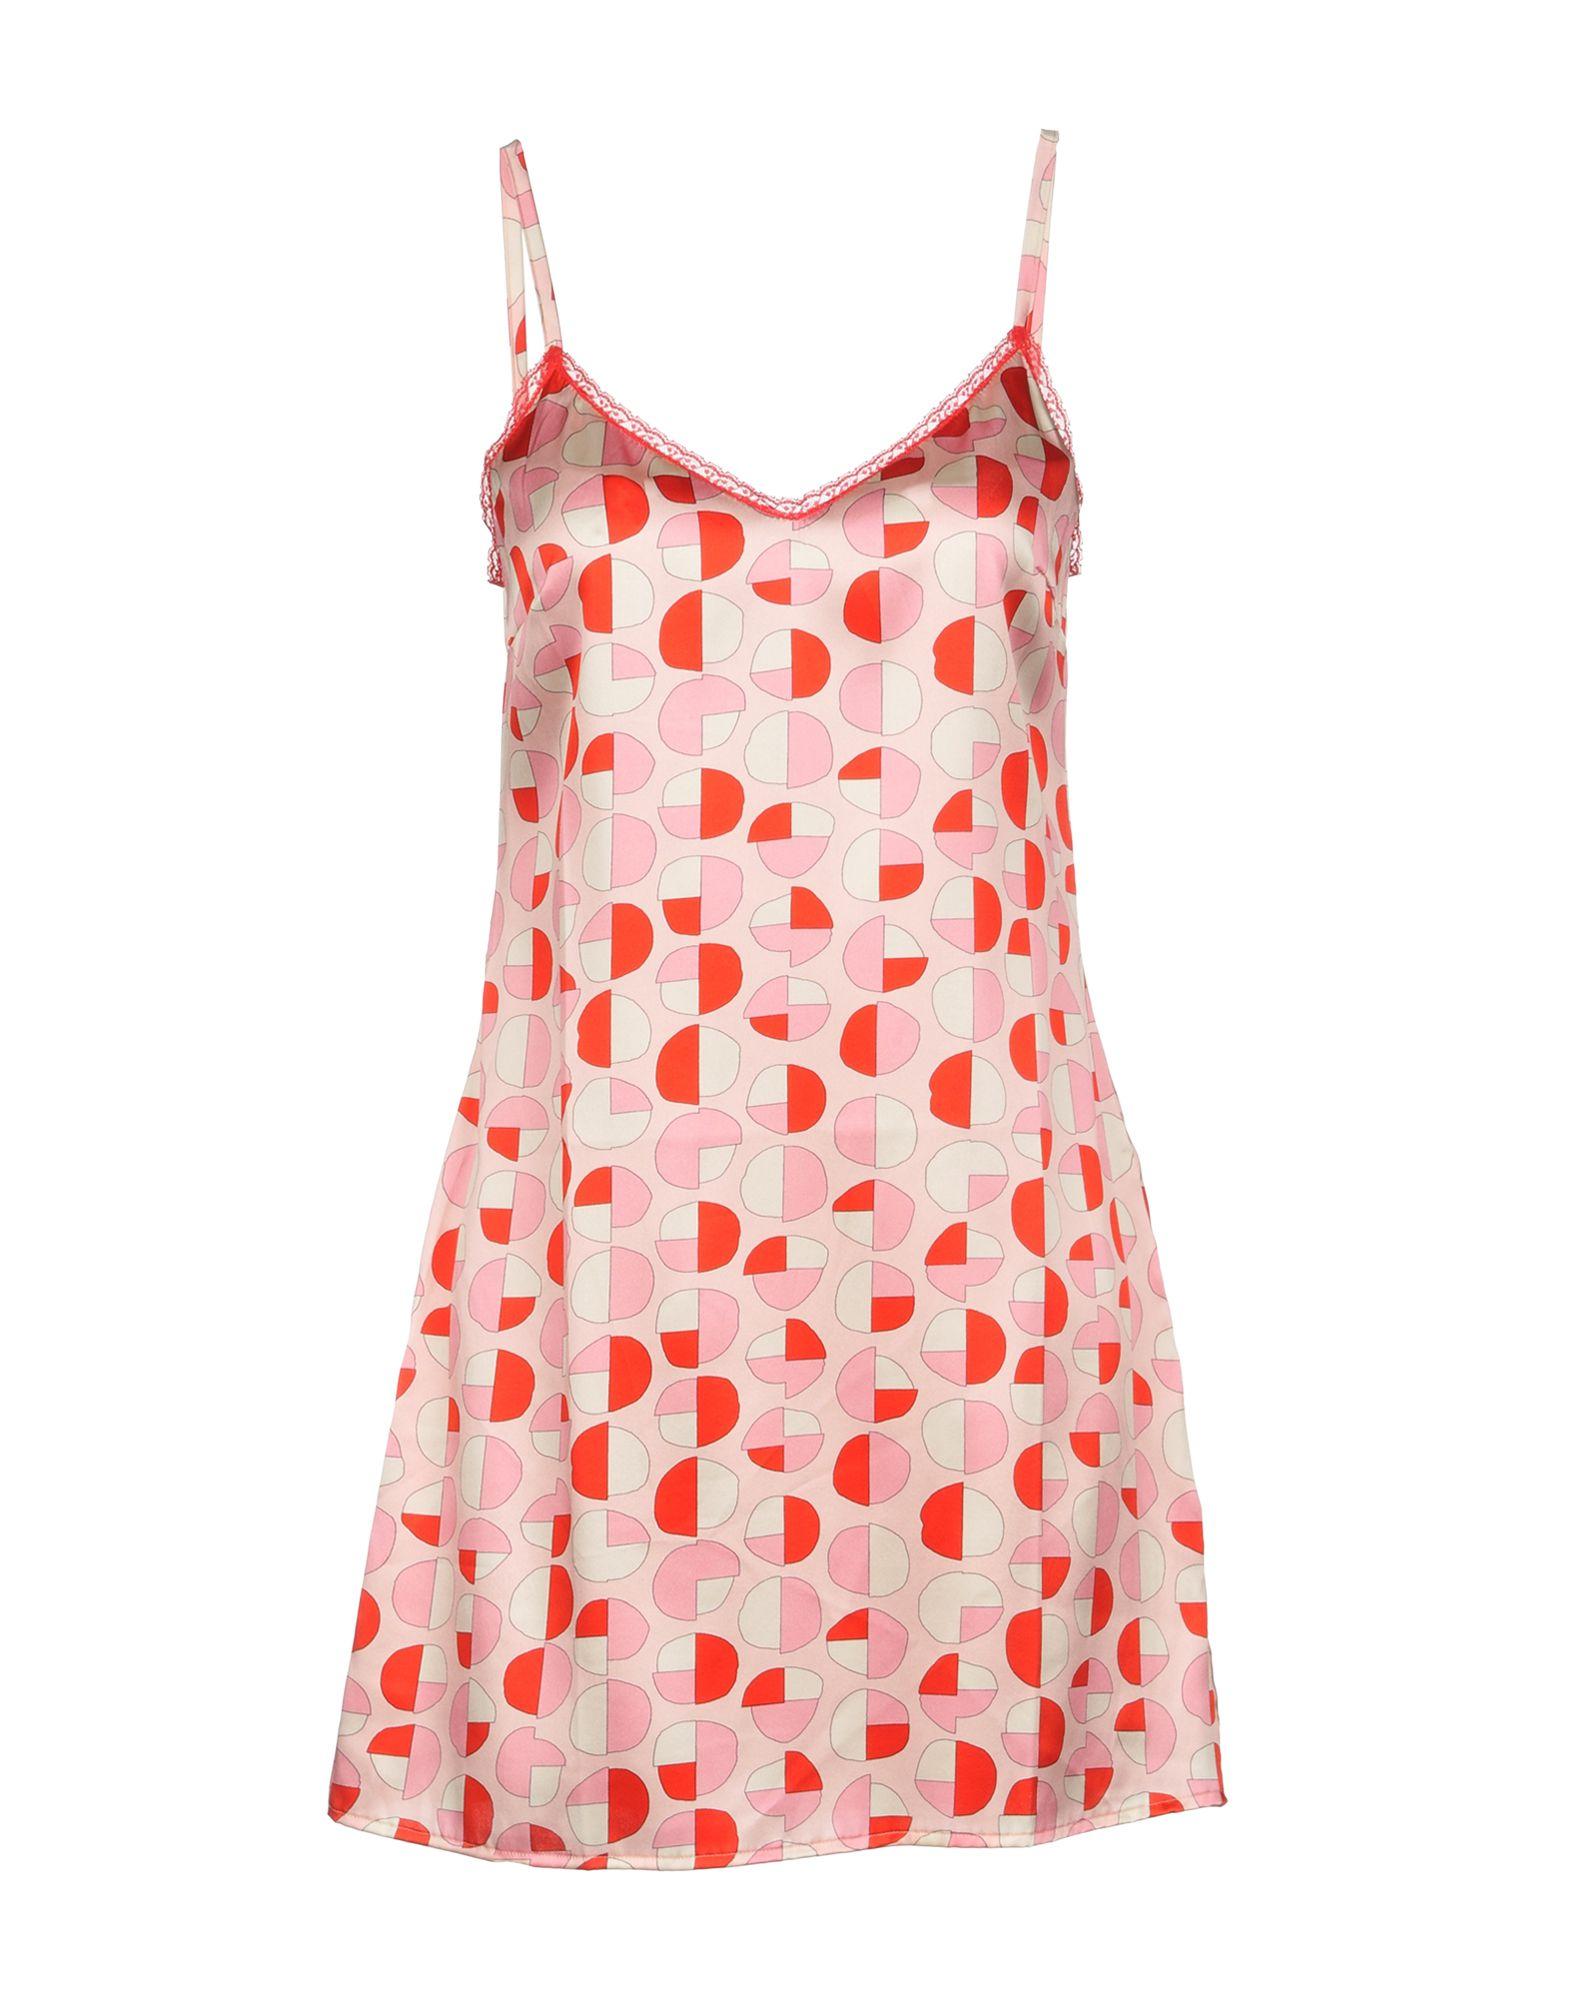 LAURA URBINATI Short Dress in Pink